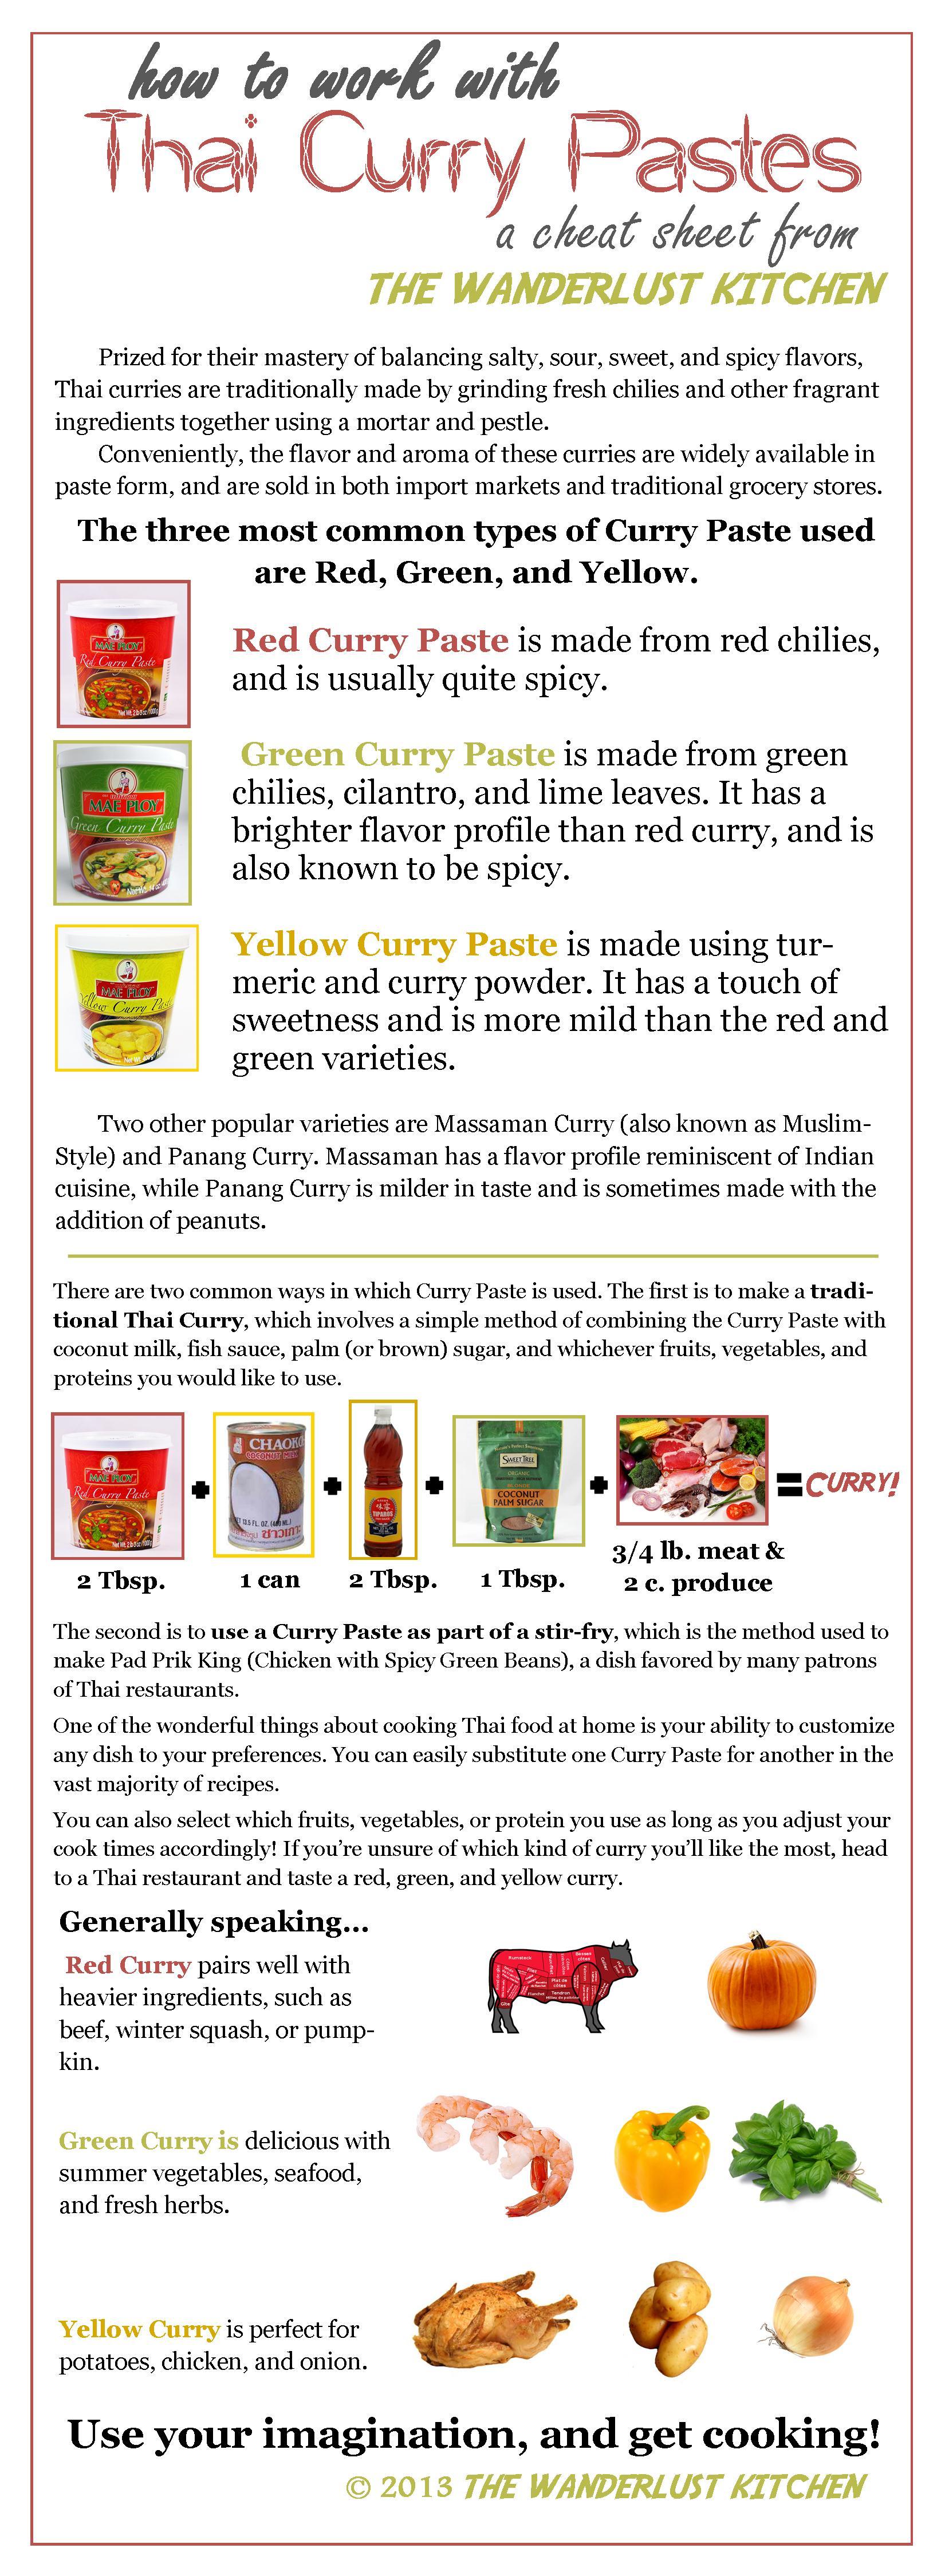 Thai Curry Cheat Sheet - The Wanderlust Kitchen